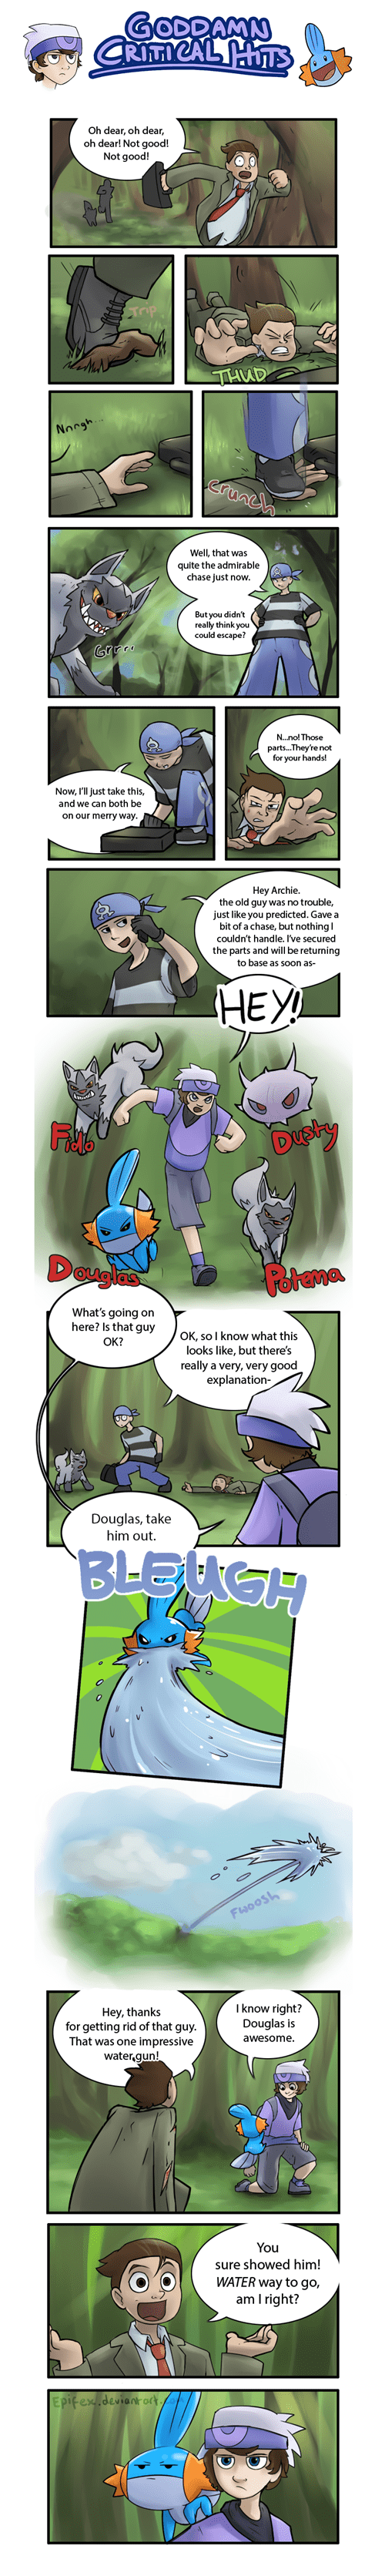 Pokémon comics puns - 7693477376